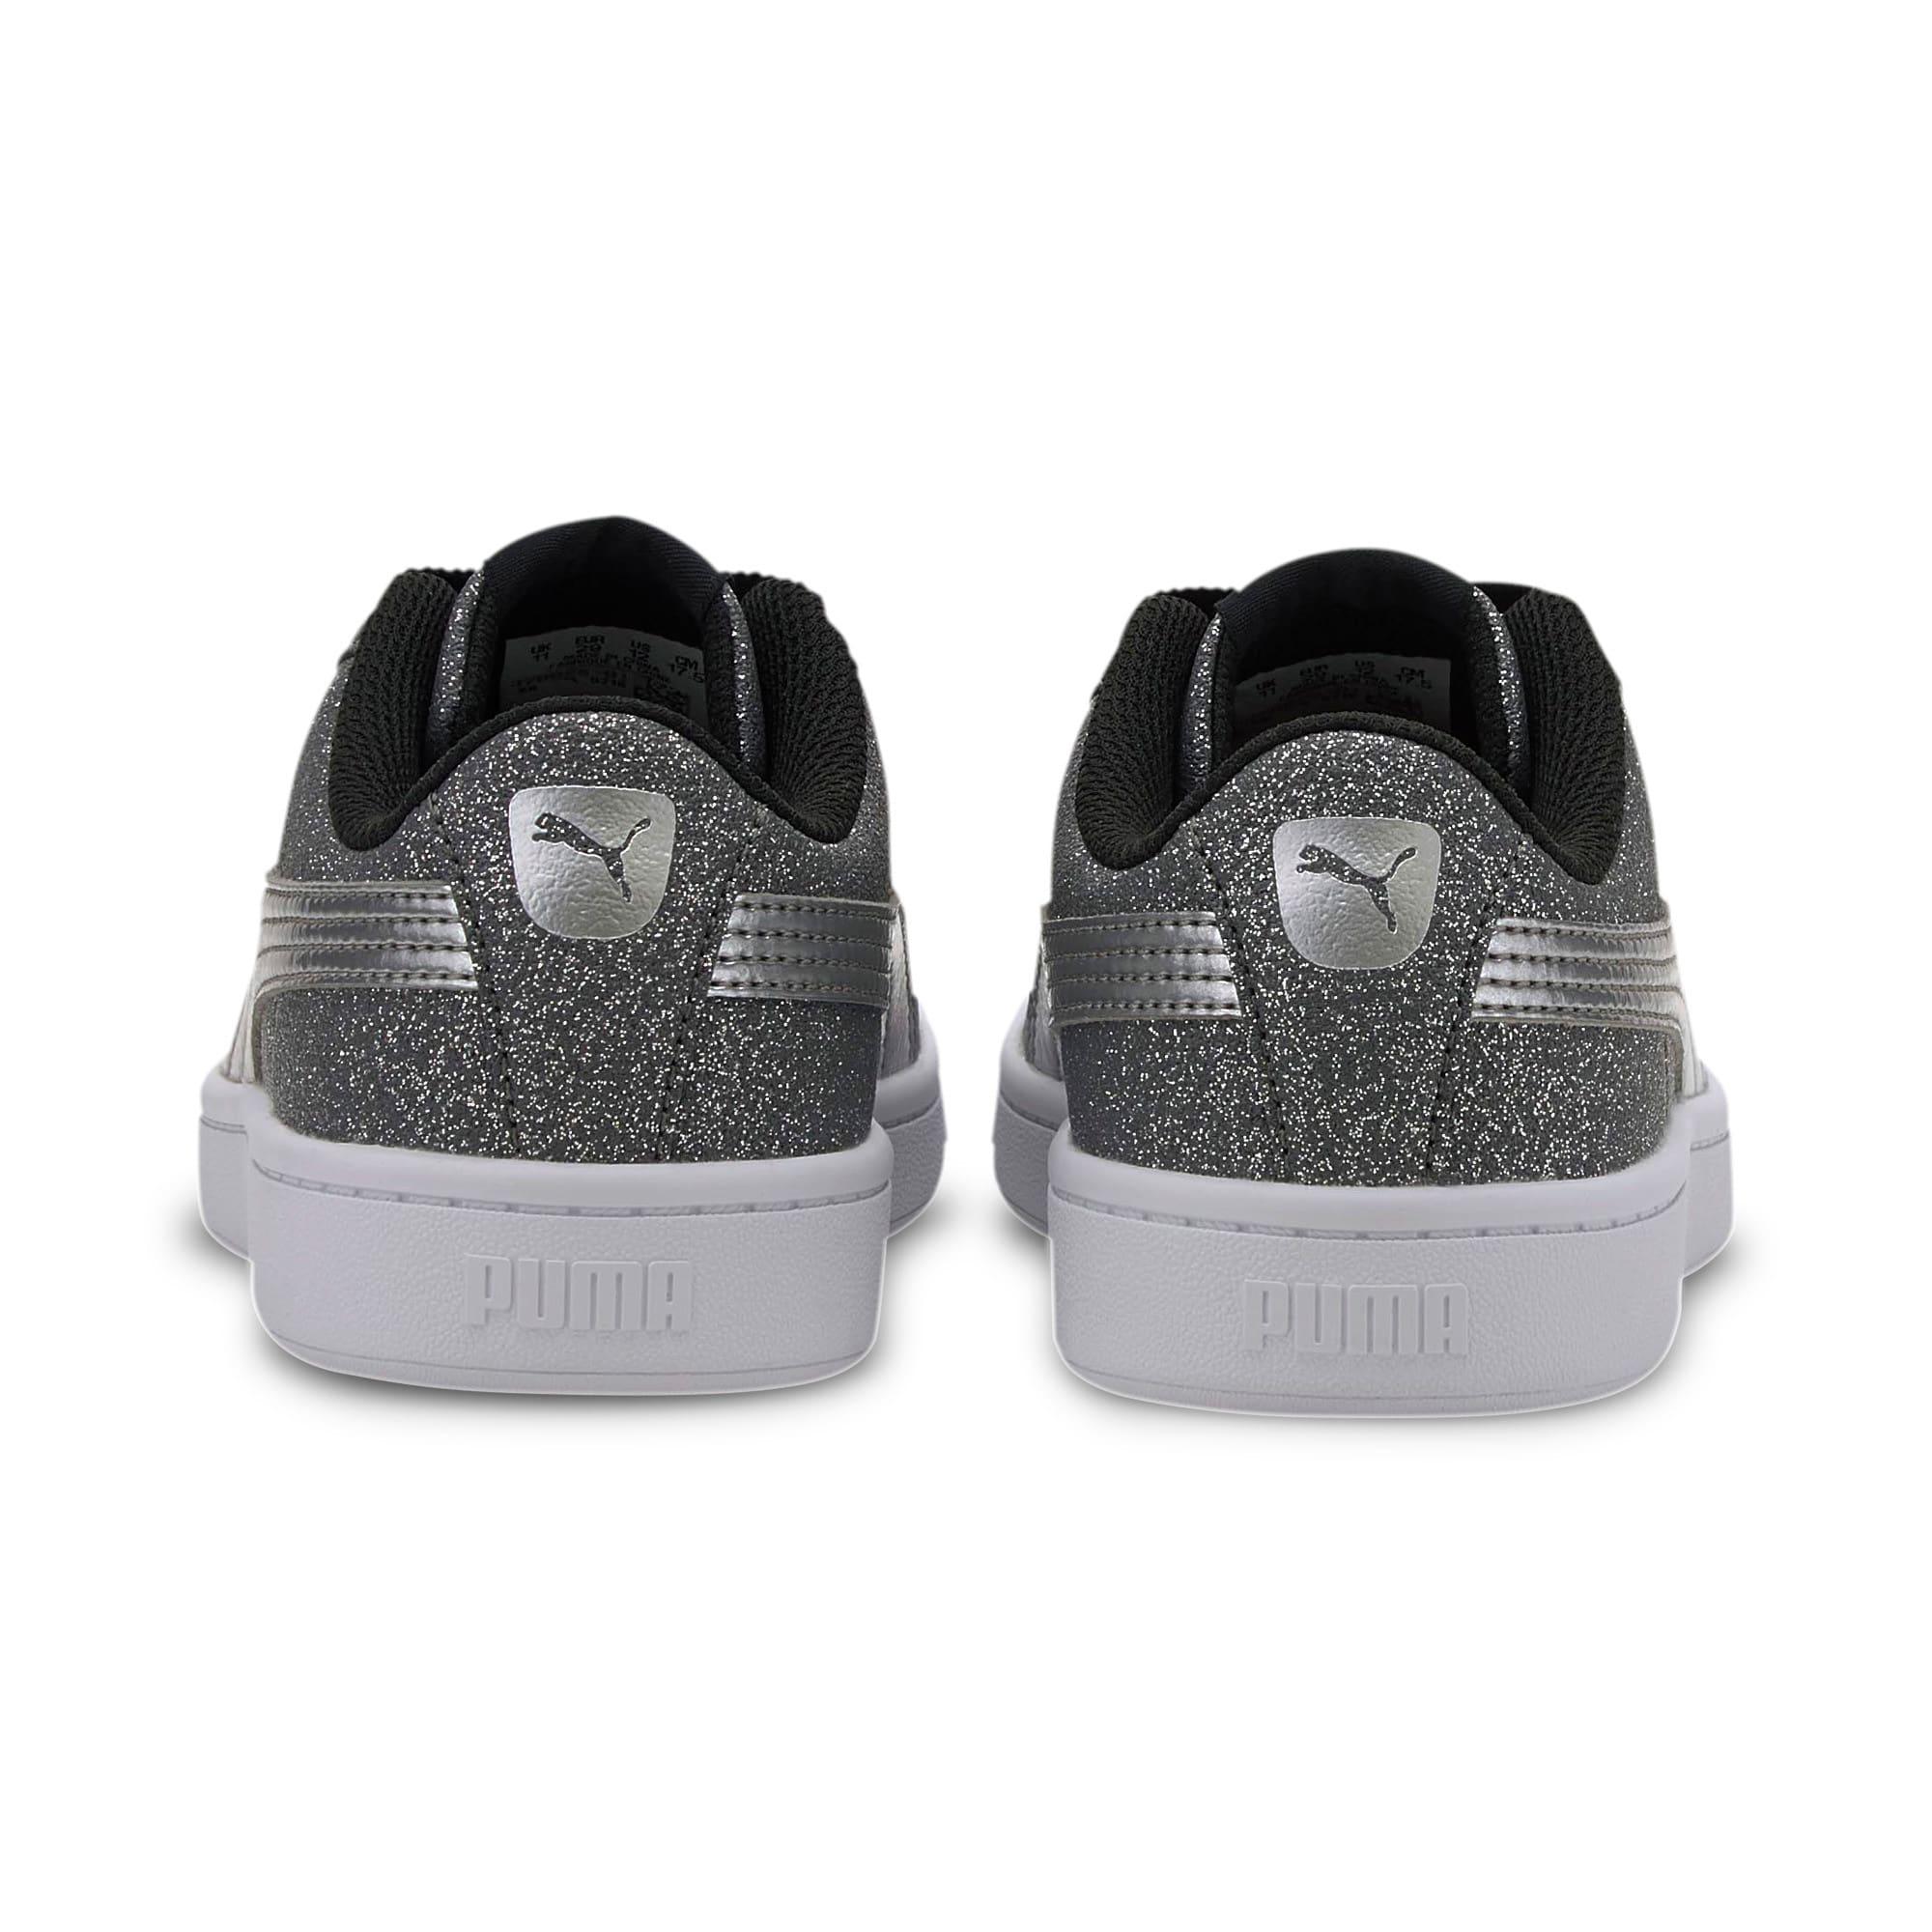 Thumbnail 3 of PUMA Vikky v2 Glitz AC Sneakers PS, Puma Black-Silver-White, medium